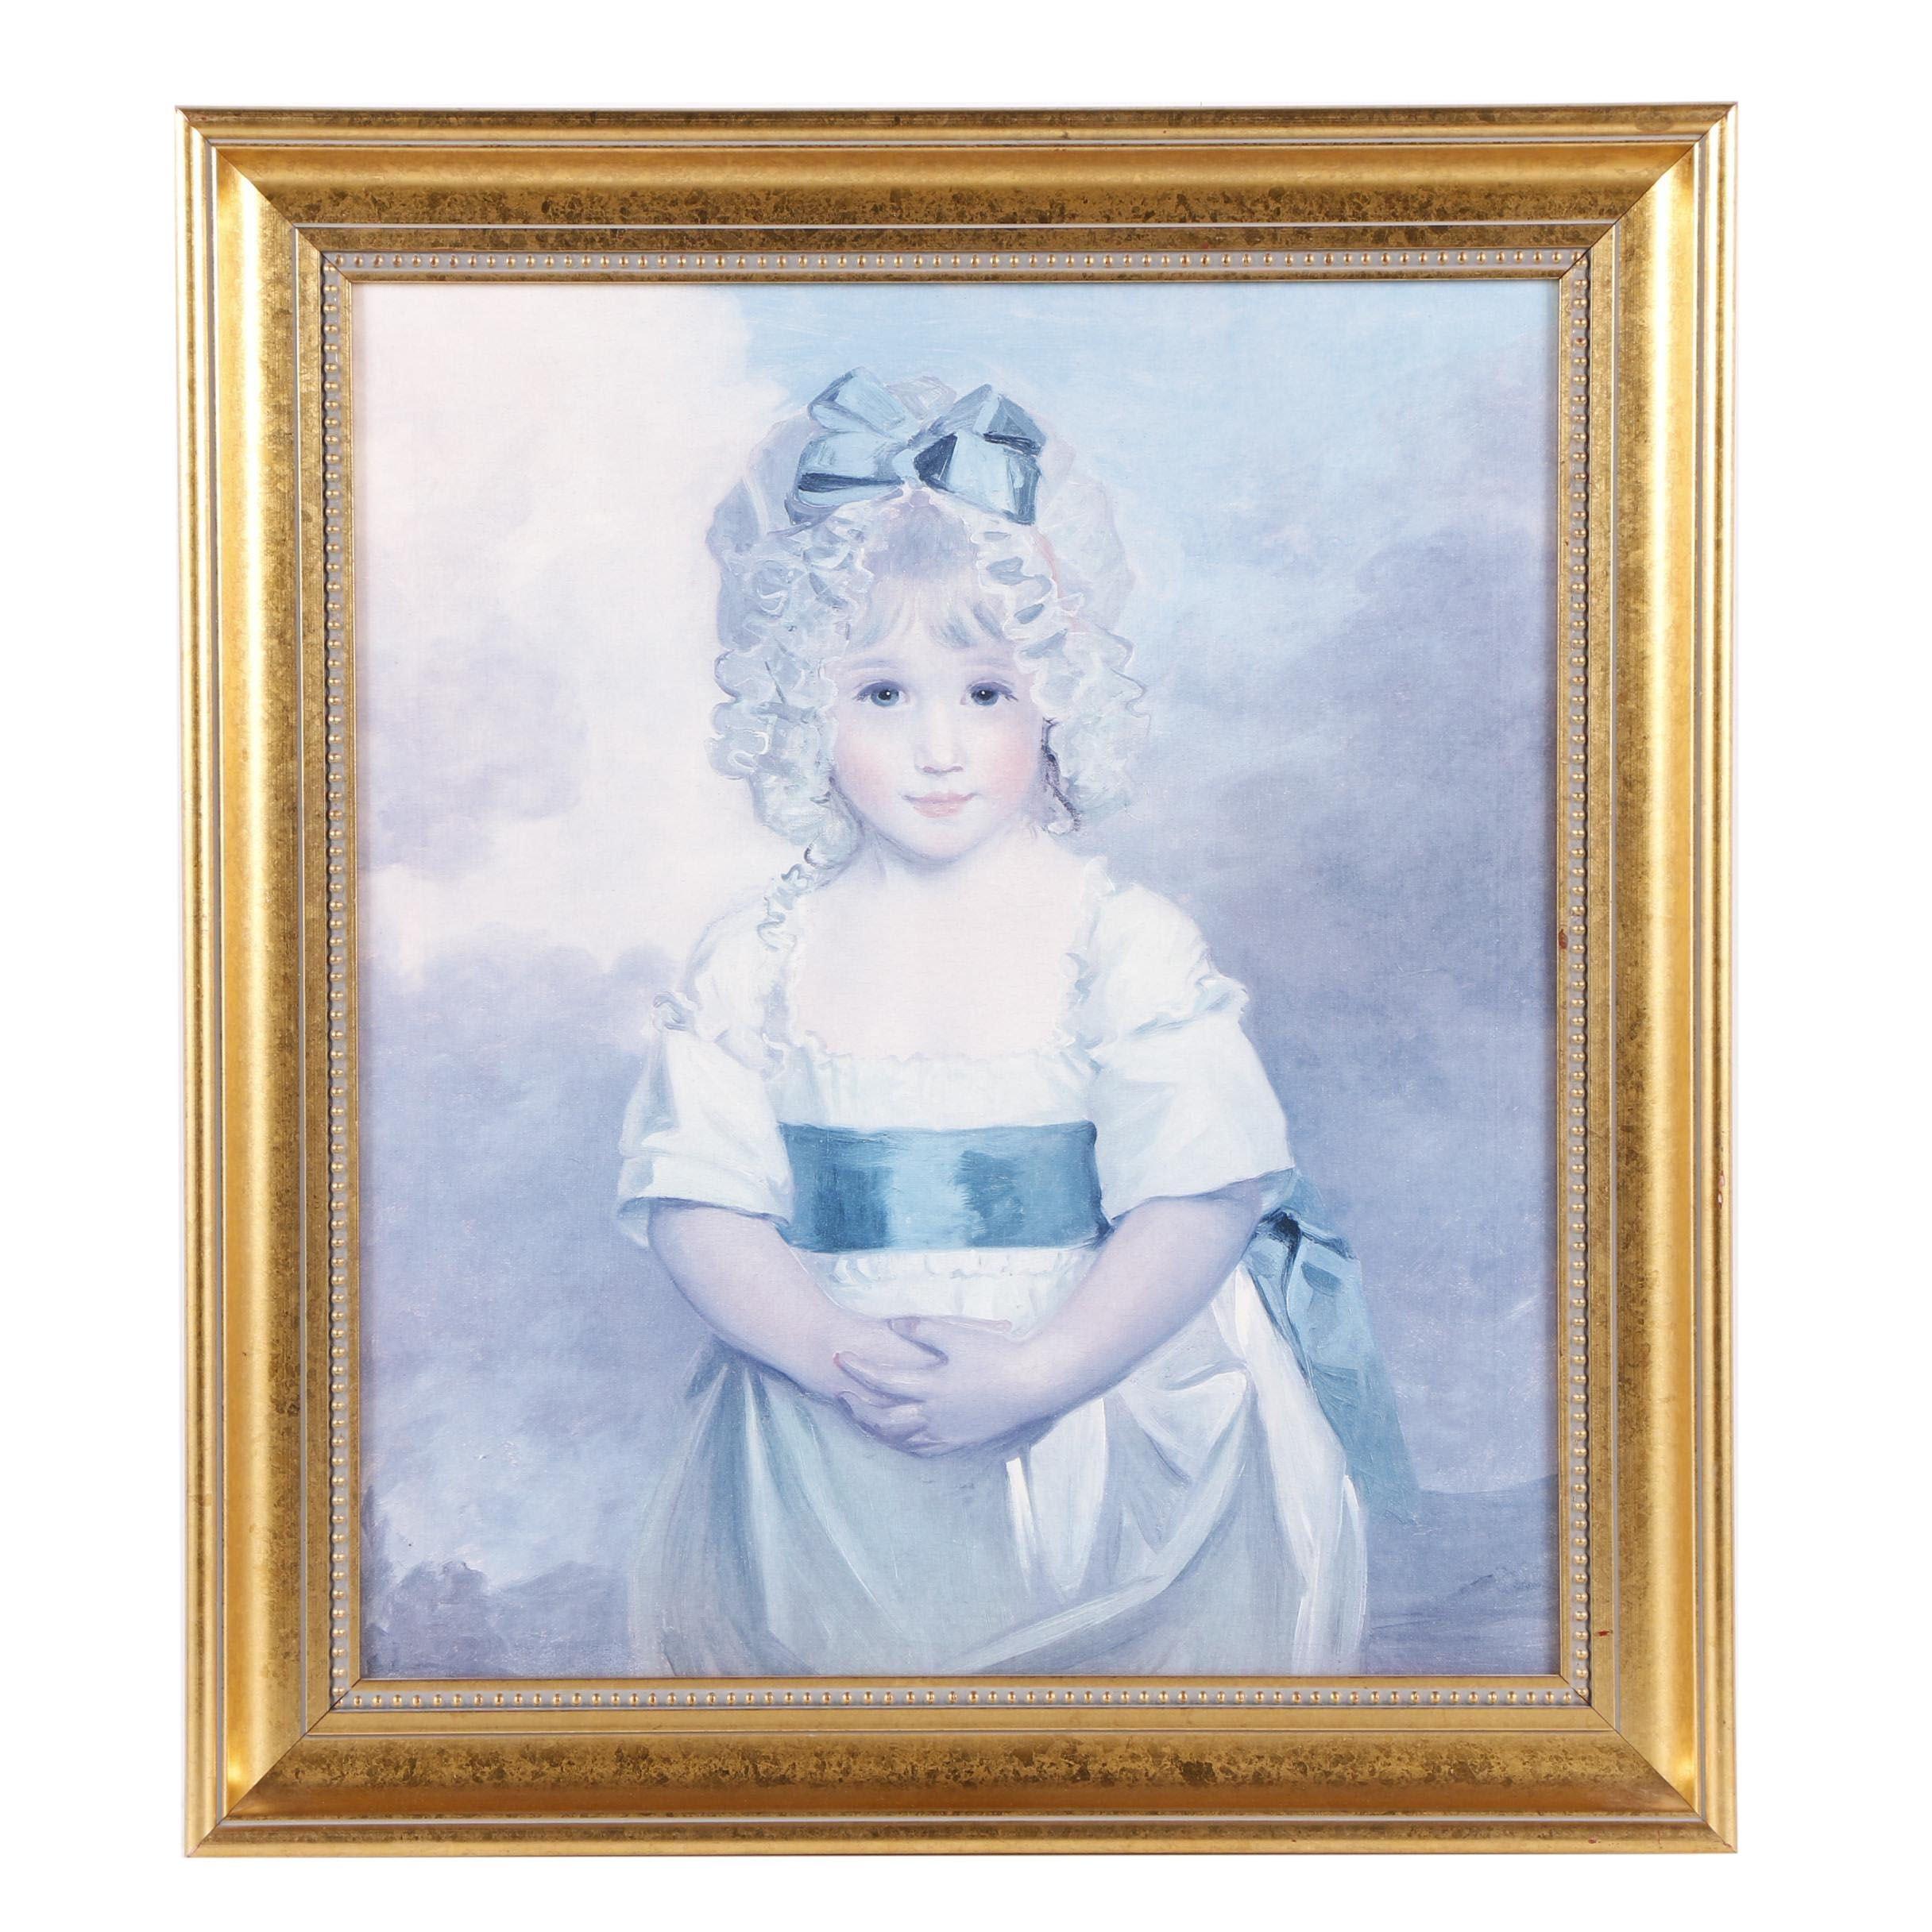 """Miss Charlotte Papendick as a Child"" Offset Lithograph after John Hoppner"